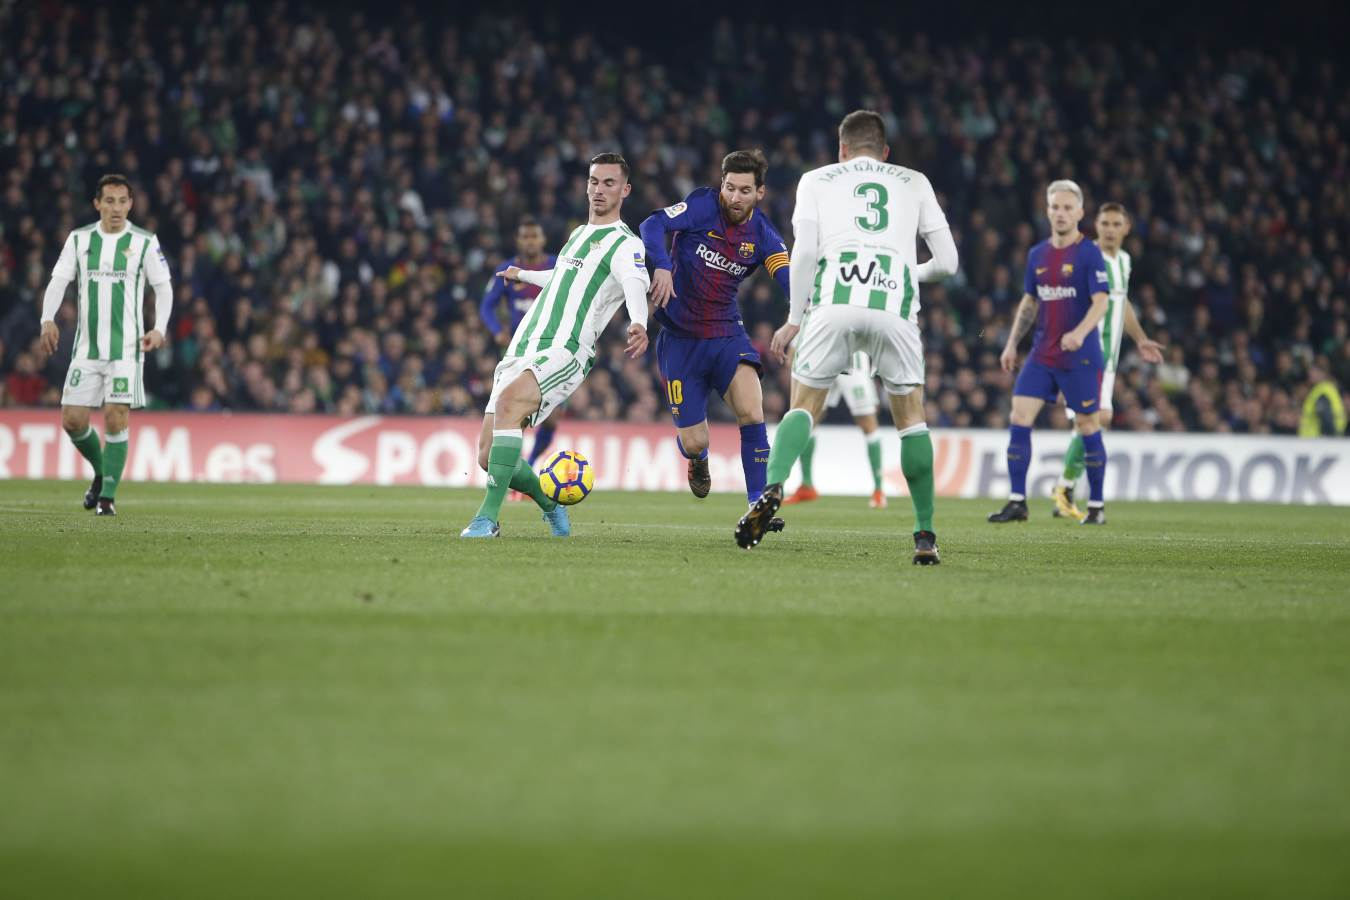 ⏰ Second half is under way at the Benito Villamarín! Betis 0-0 FC Barcelona �� Let's go! ���� #ForçaBarça #BetisBarça https://t.co/VvRXwrfUxC